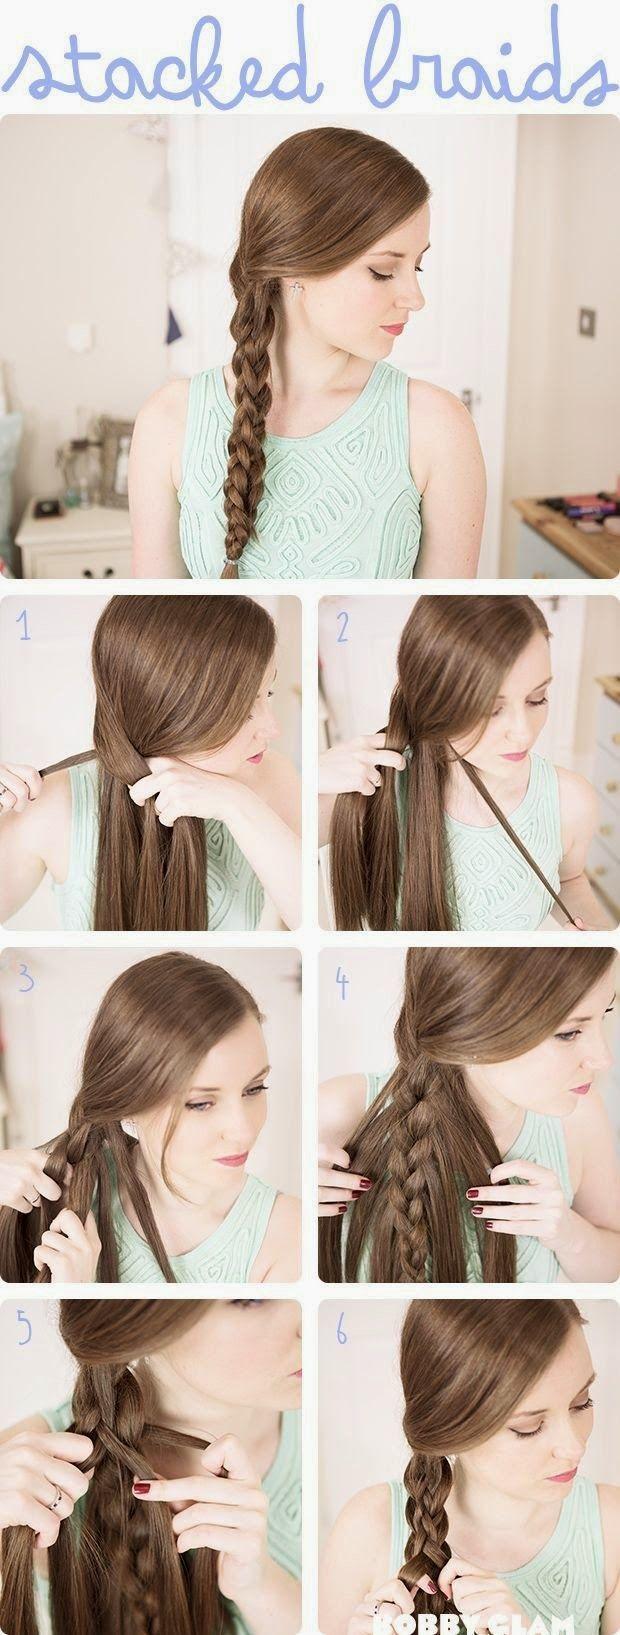 Cool Braids for Teens   popular hair tutorials 2014 for teens